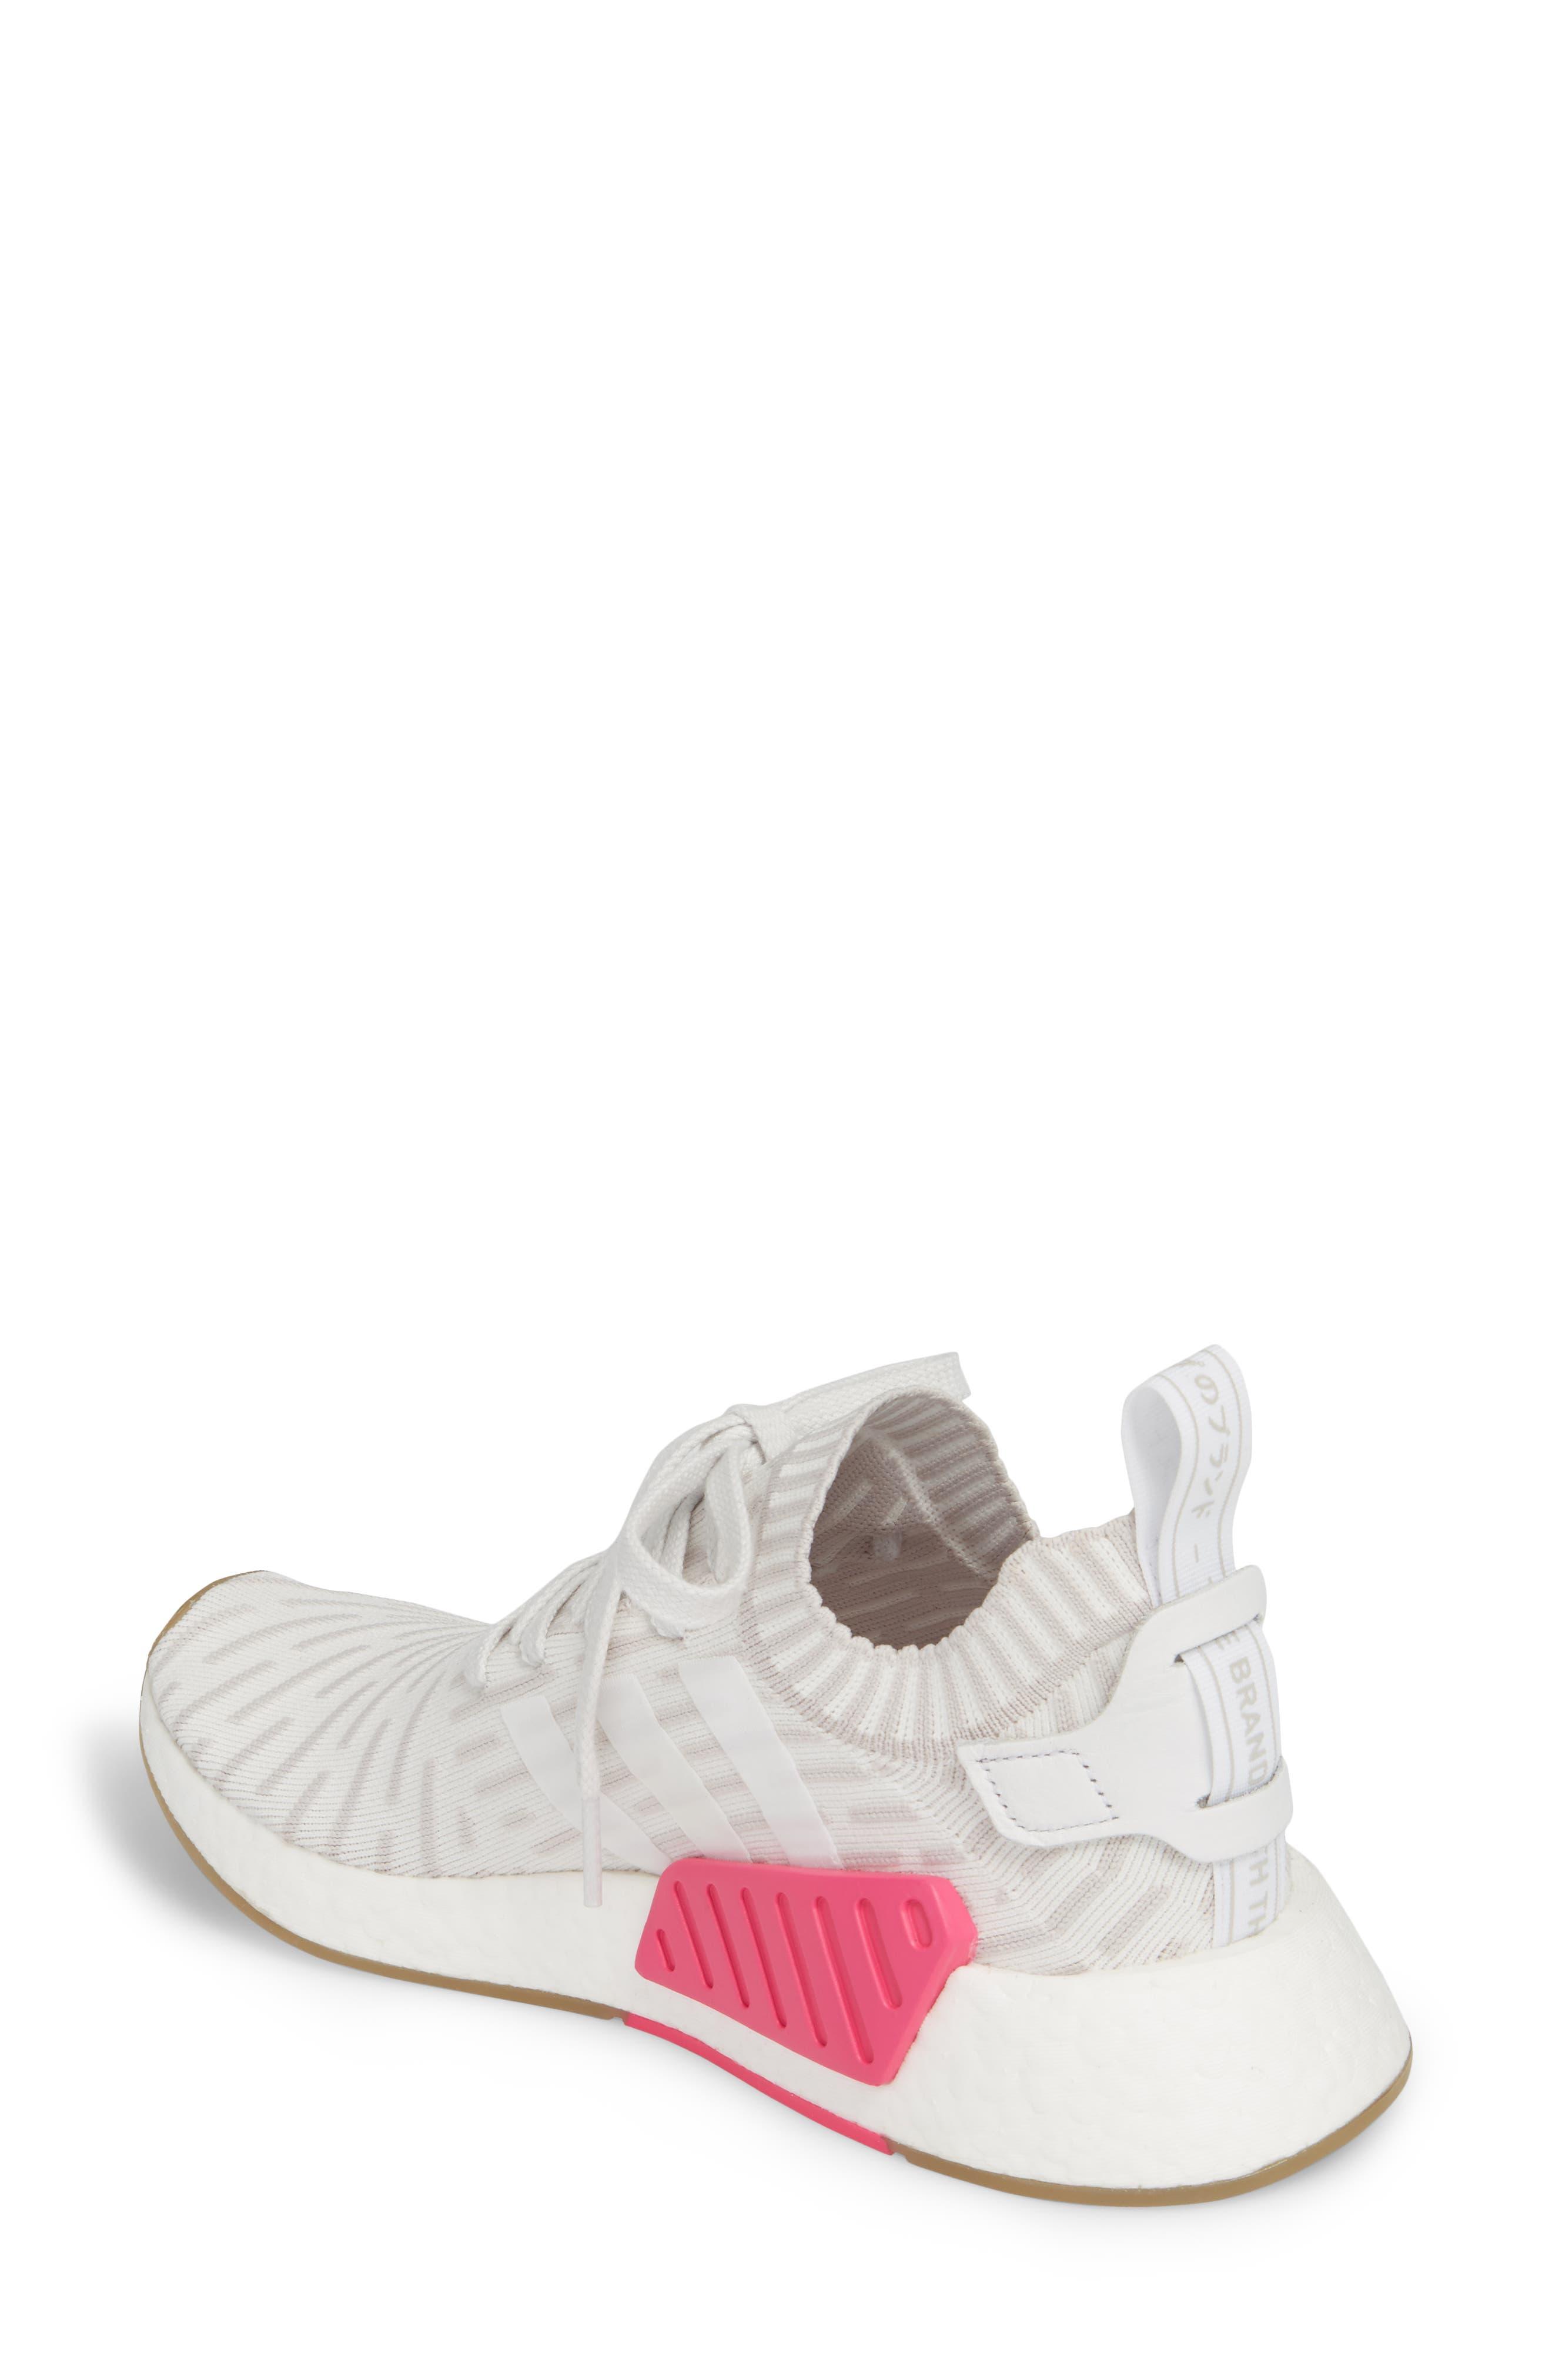 NMD R2 Primeknit Athletic Shoe,                             Alternate thumbnail 6, color,